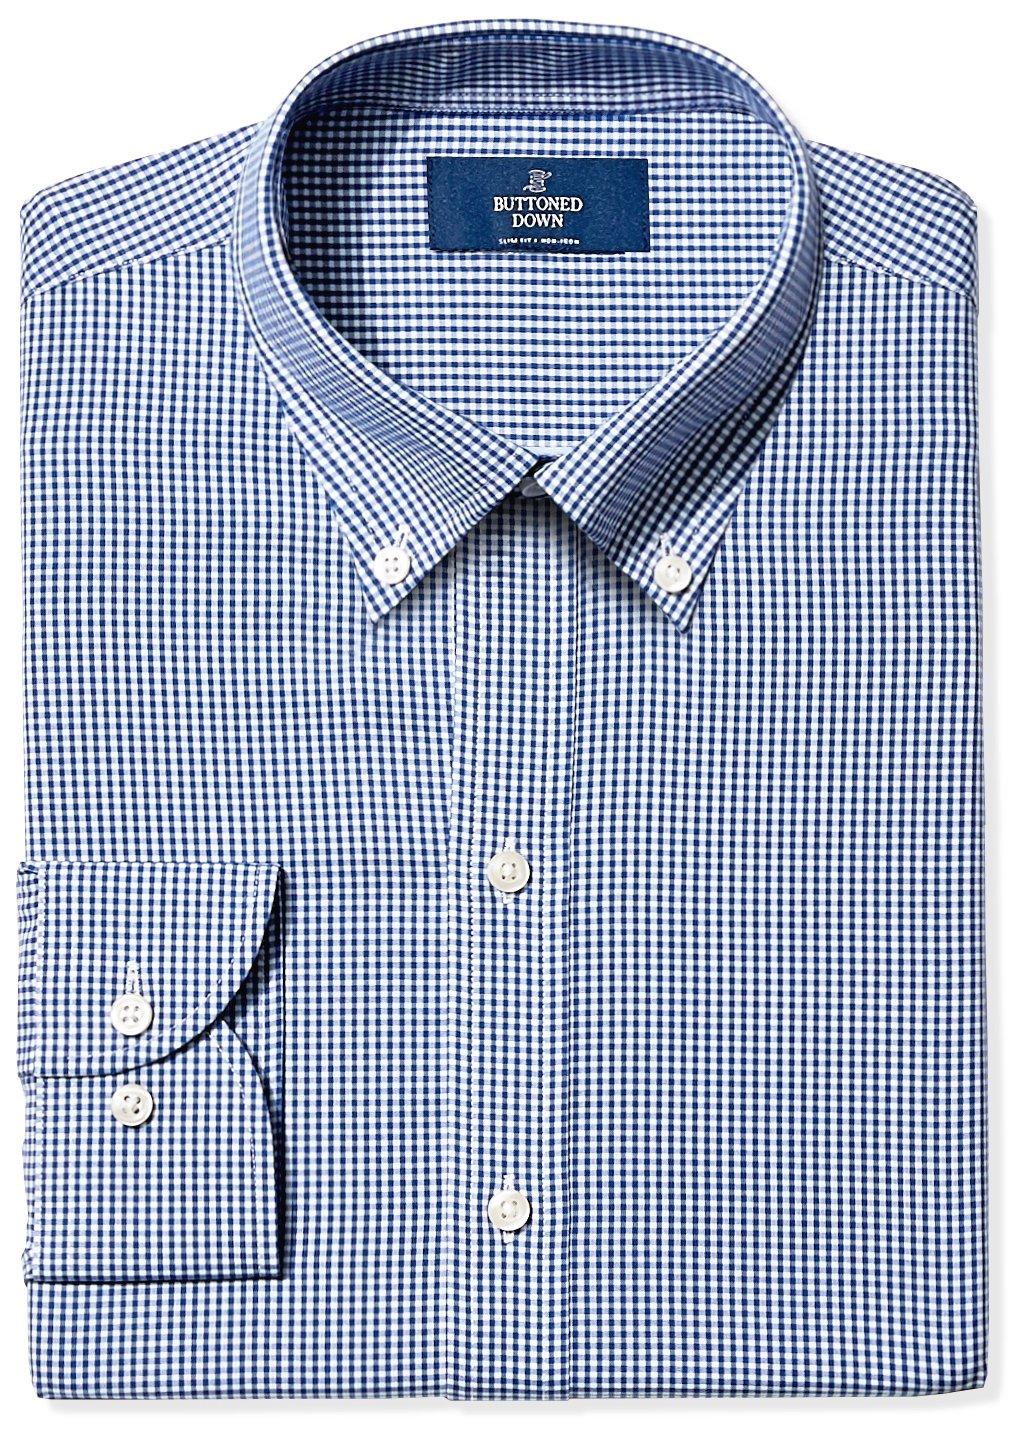 Buttoned Down Men's Slim Fit Button-Collar Non-Iron Dress Shirt, Blue Gingham, 17'' Neck 36'' Sleeve